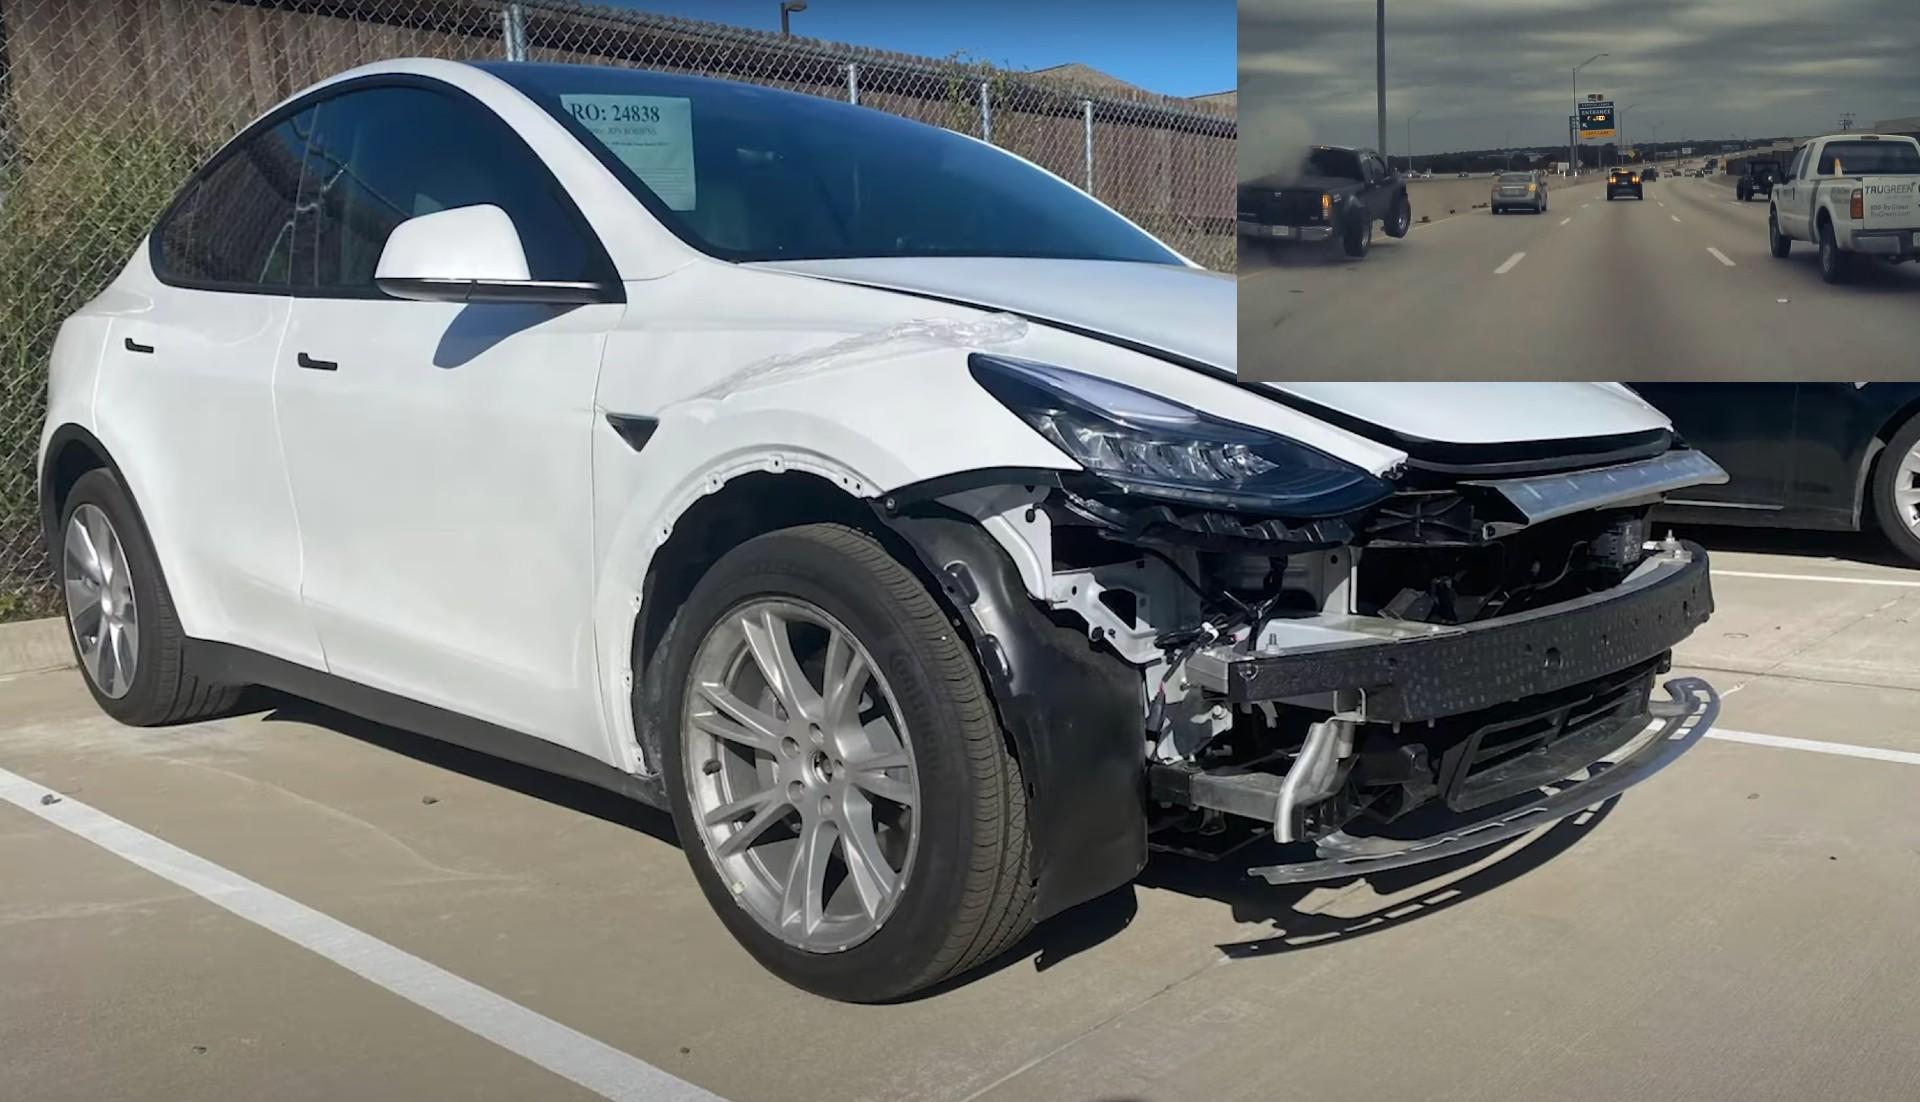 Tesla-Model-Y-sends-Nissan-truck-flying